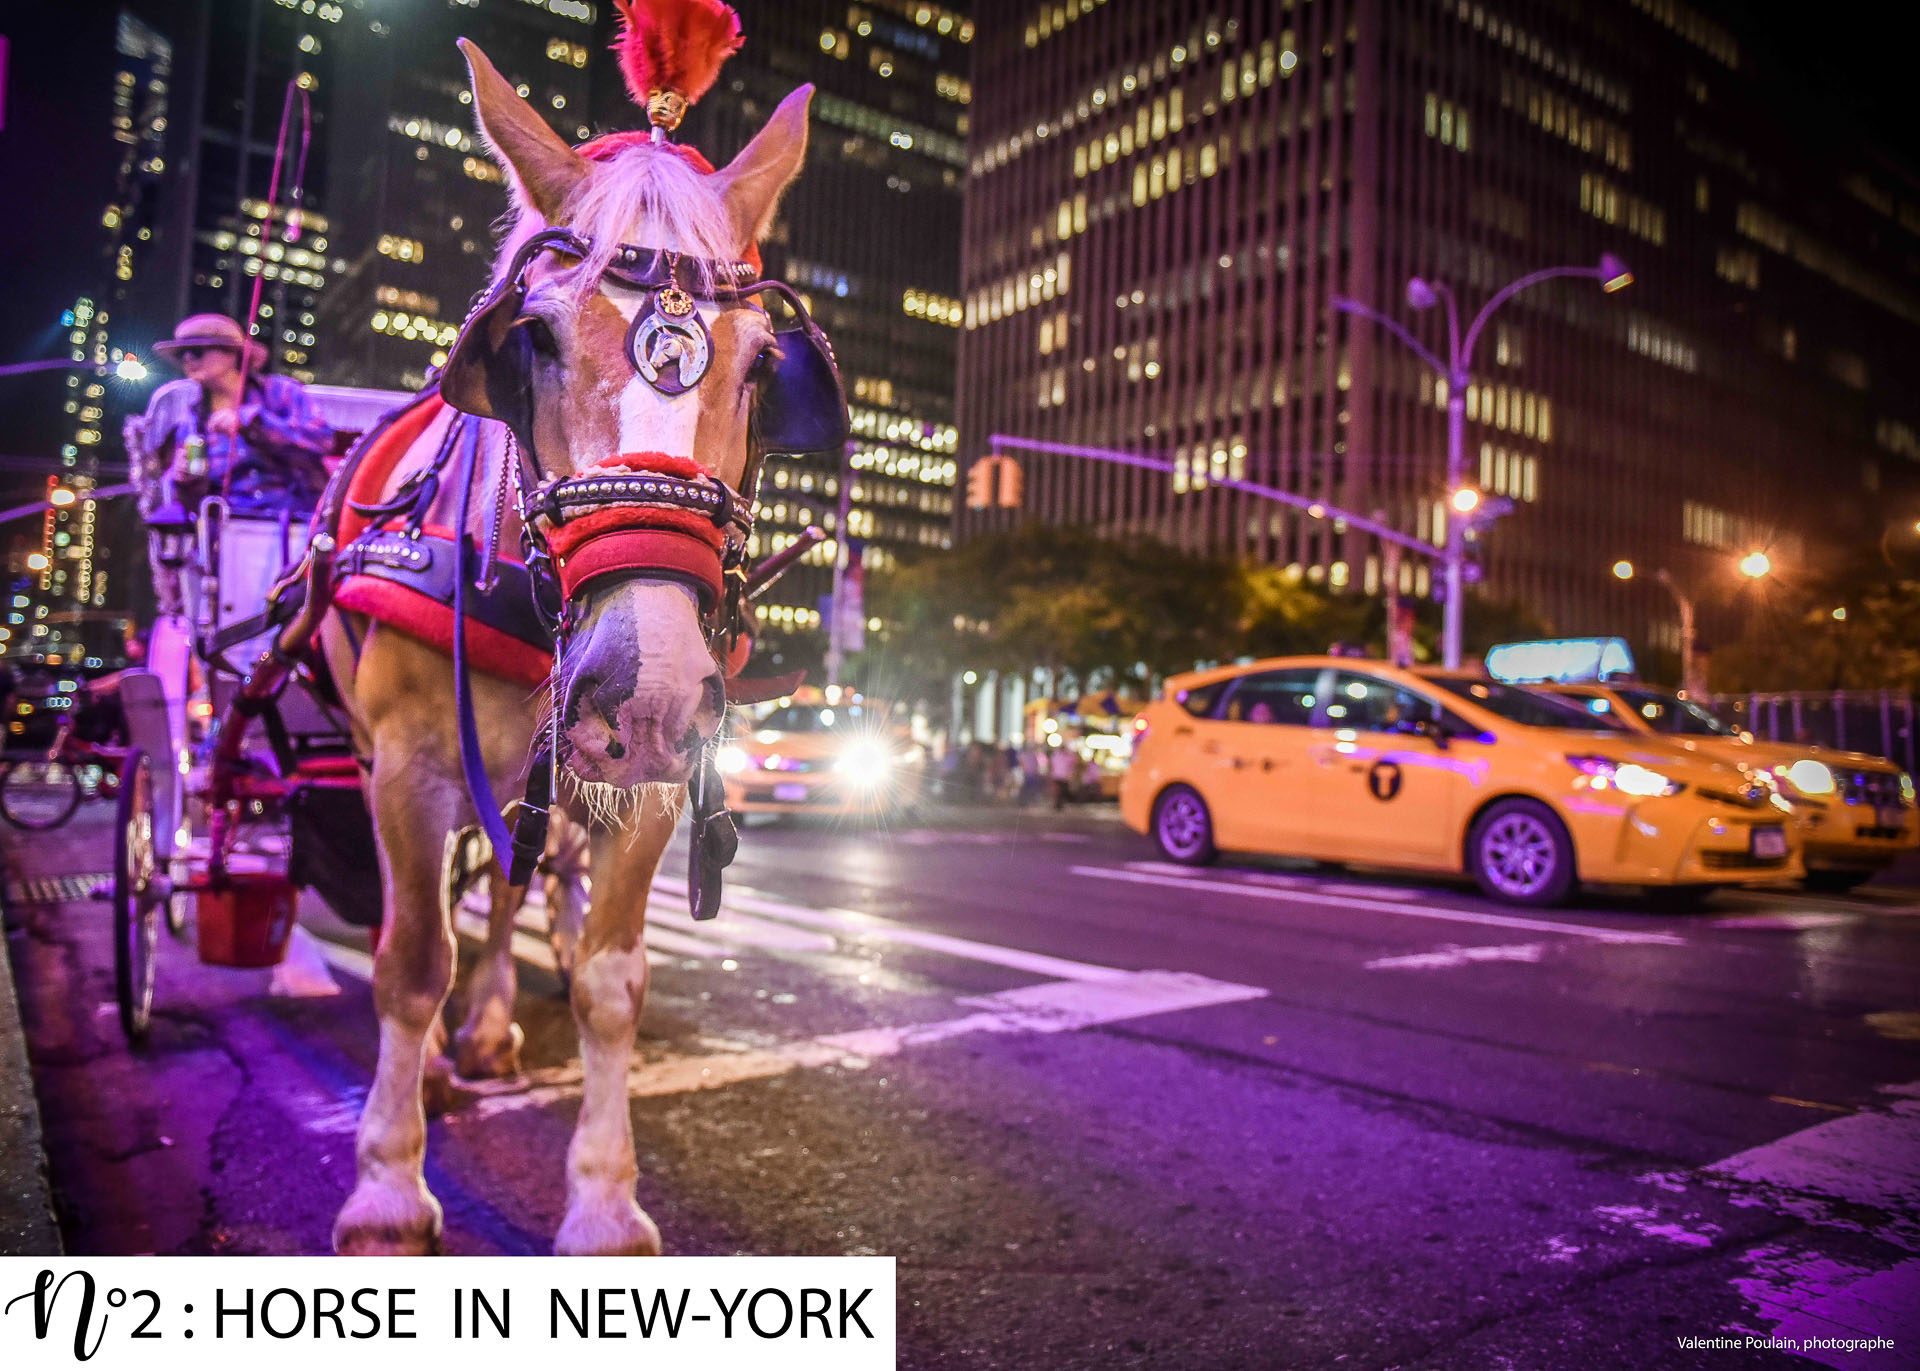 TIRAGE NYC -Valentine Poulain